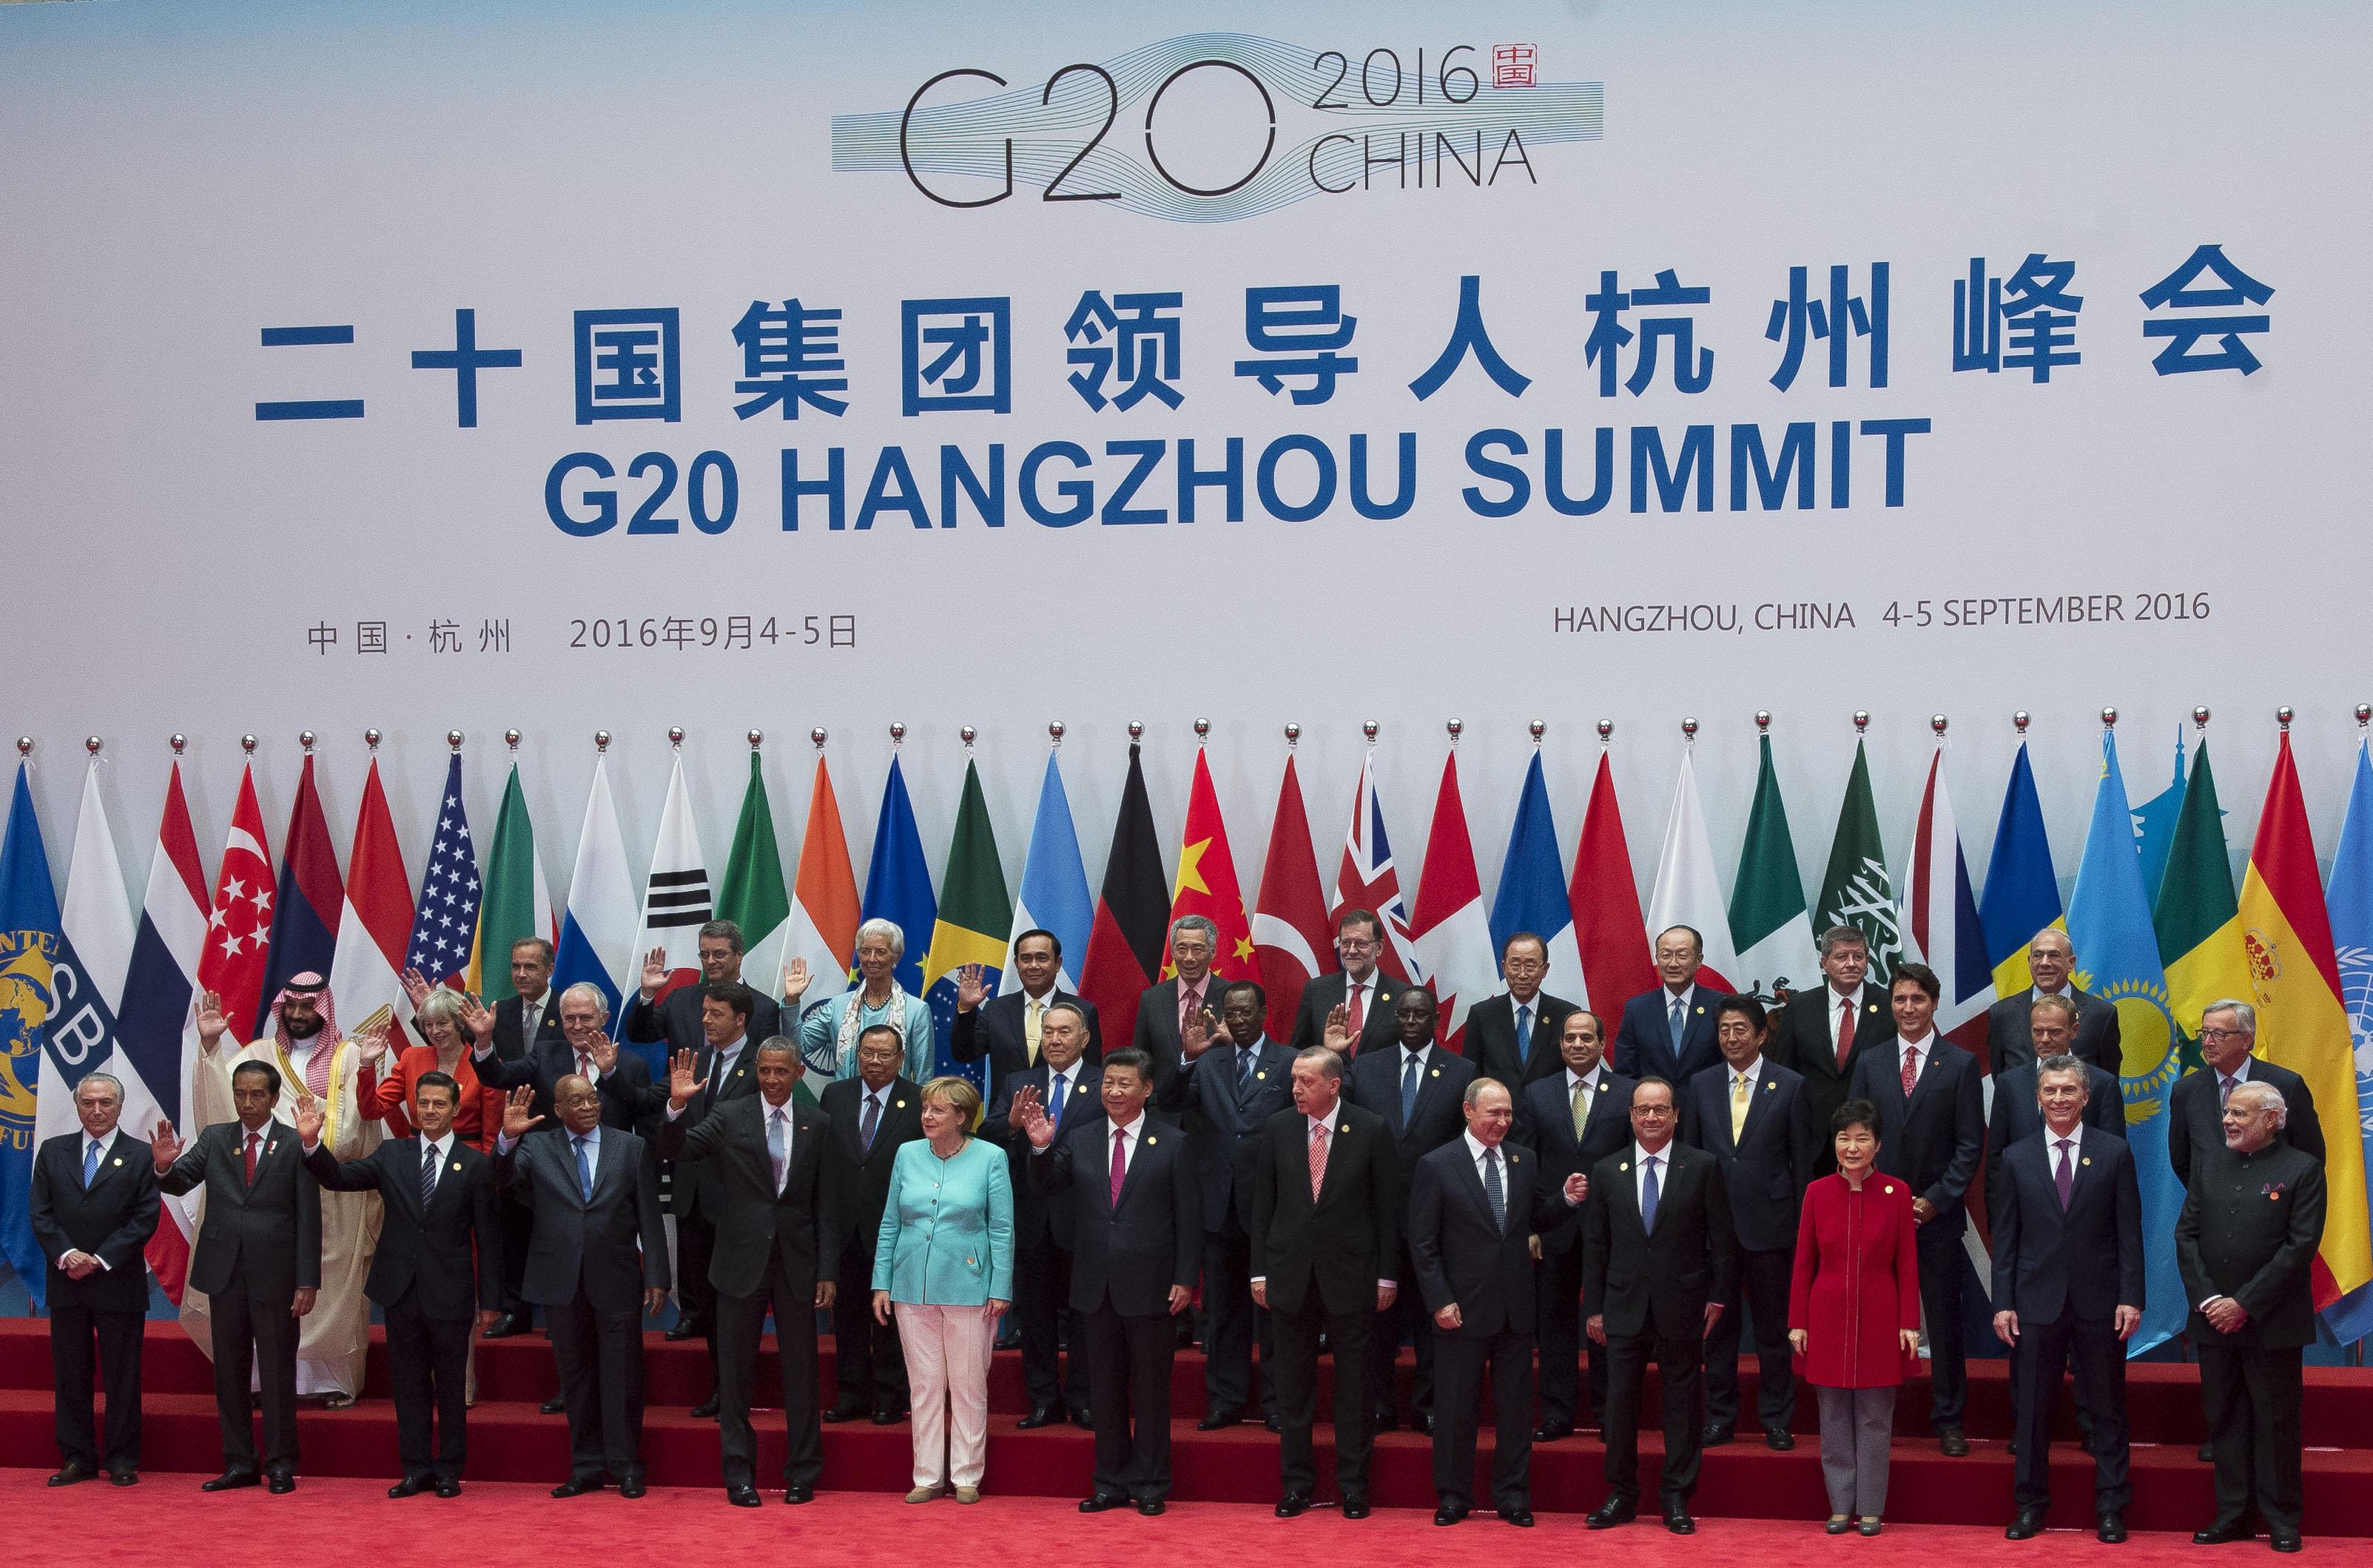 Uniview ارائه دهنده راهکارهای نظارت تصویری برای اجلاس G20